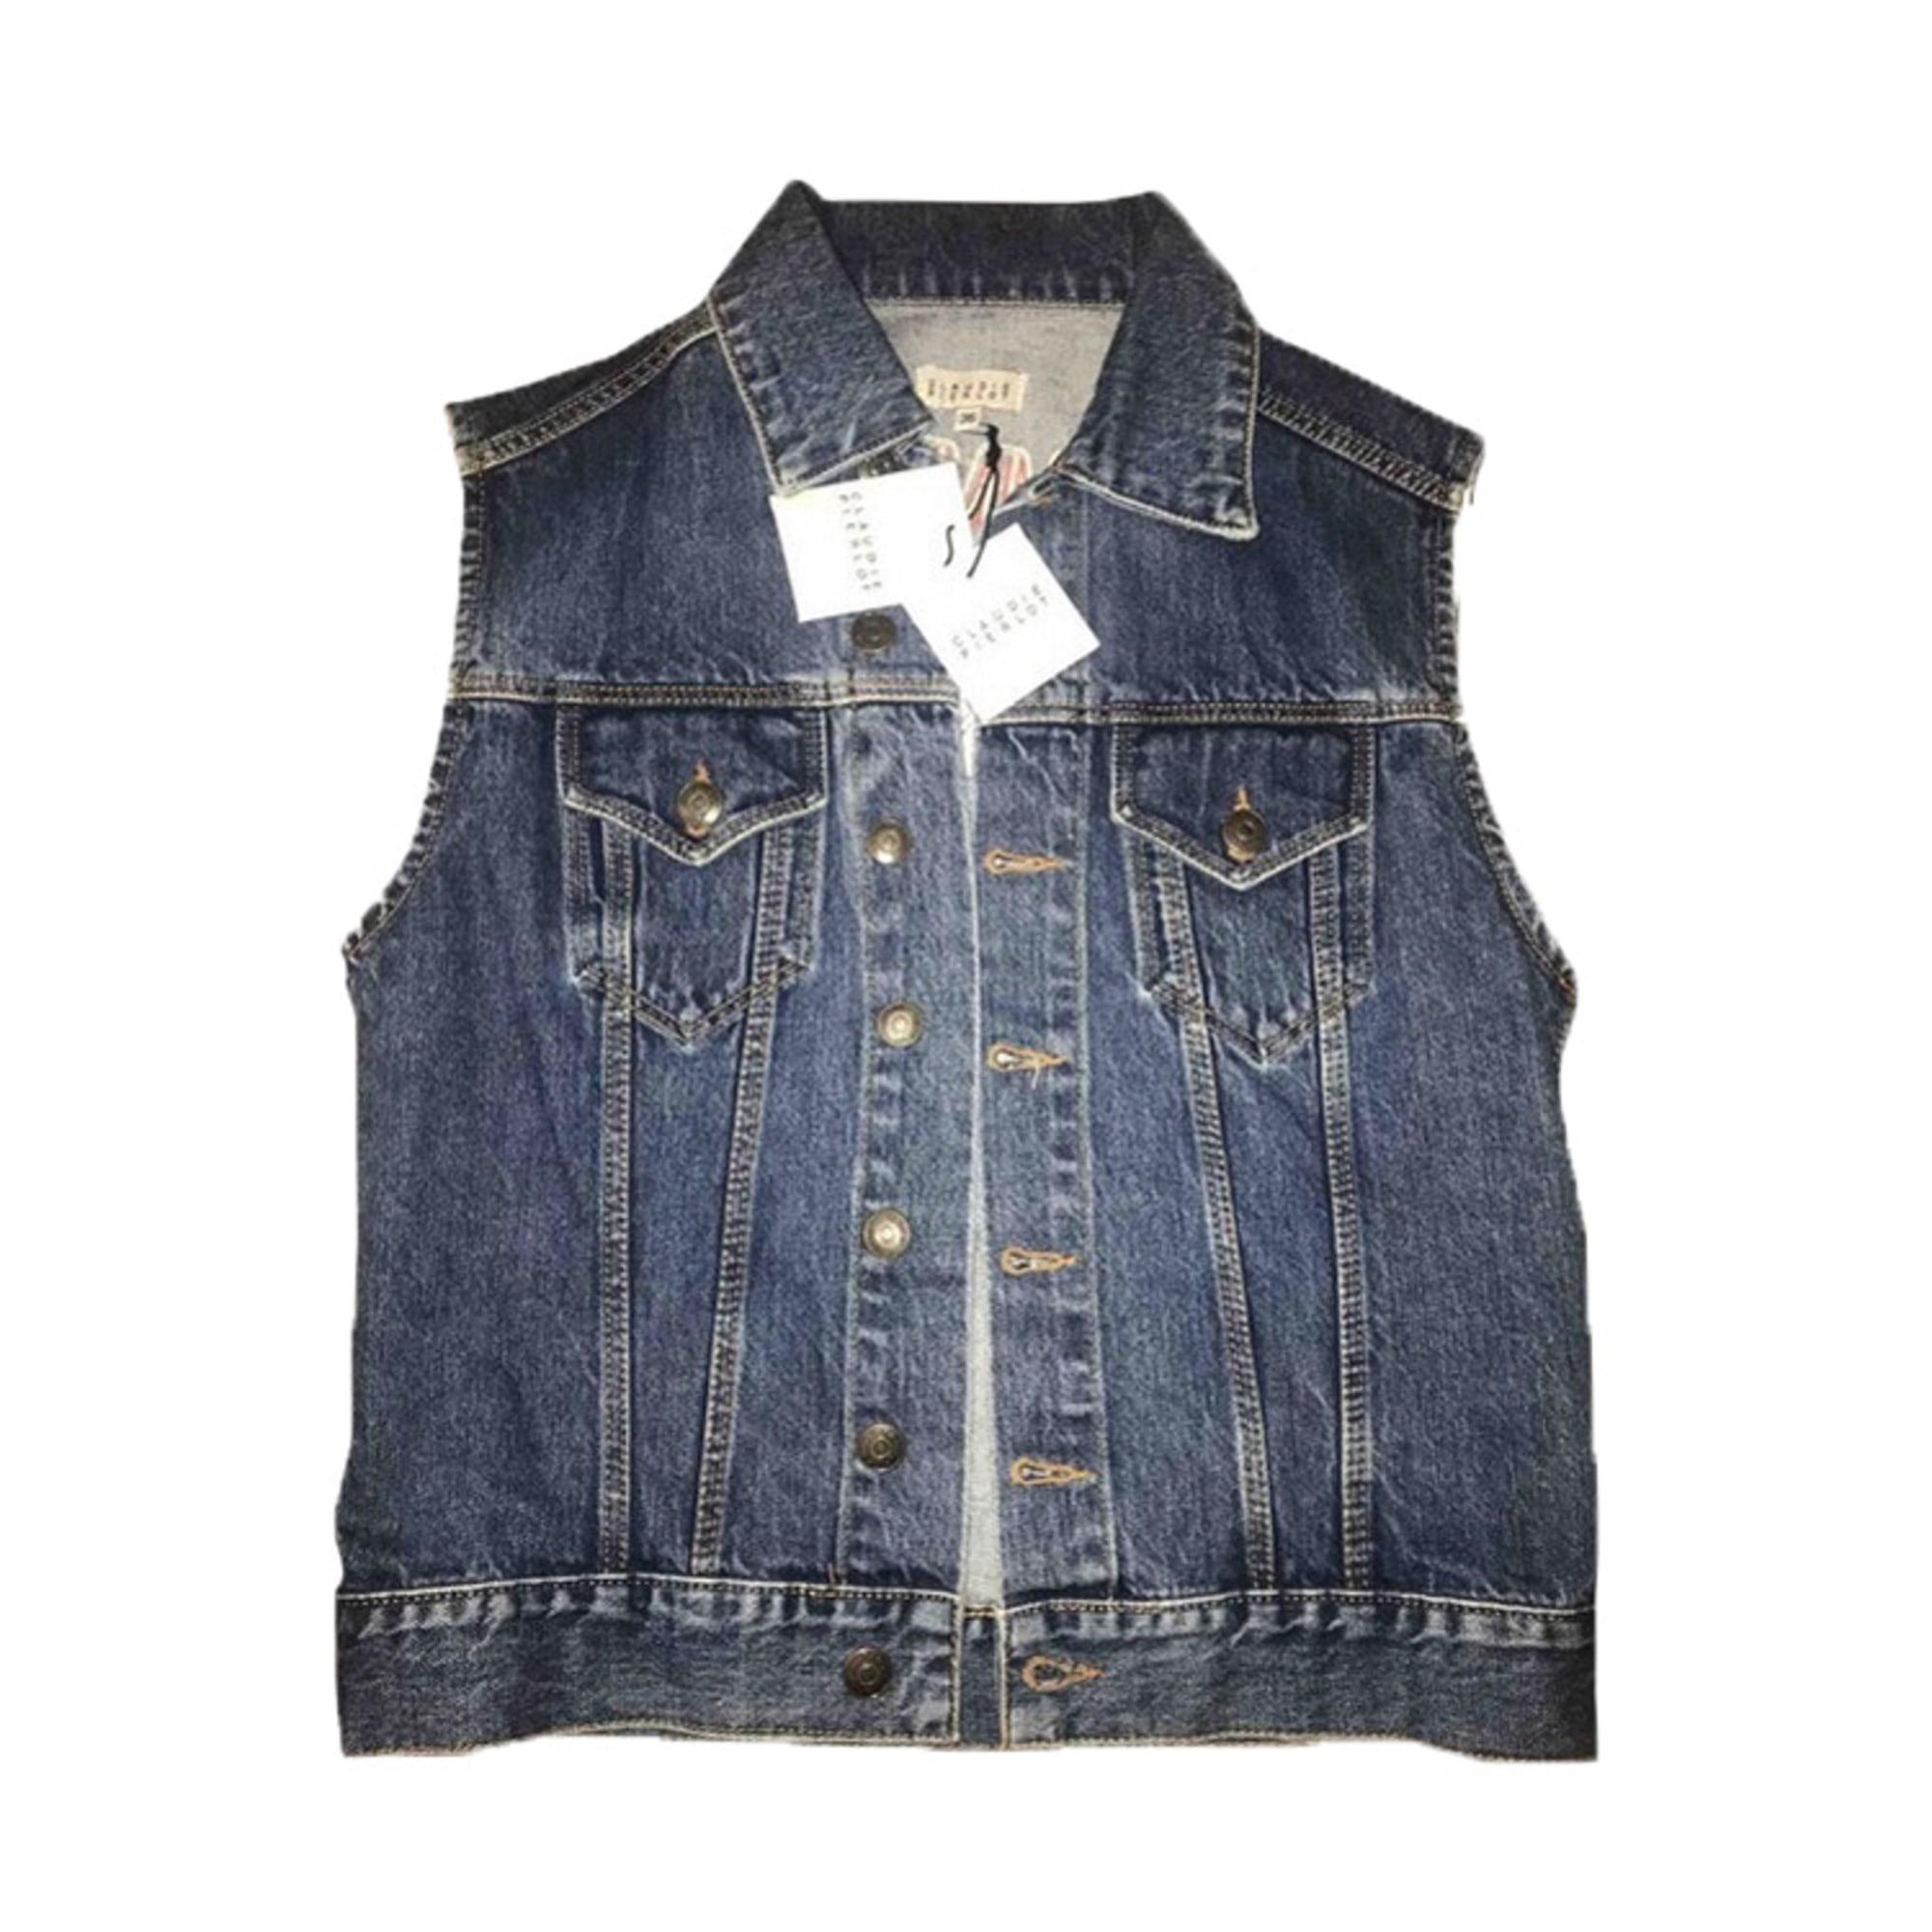 Denim Jacket CLAUDIE PIERLOT Blue, navy, turquoise